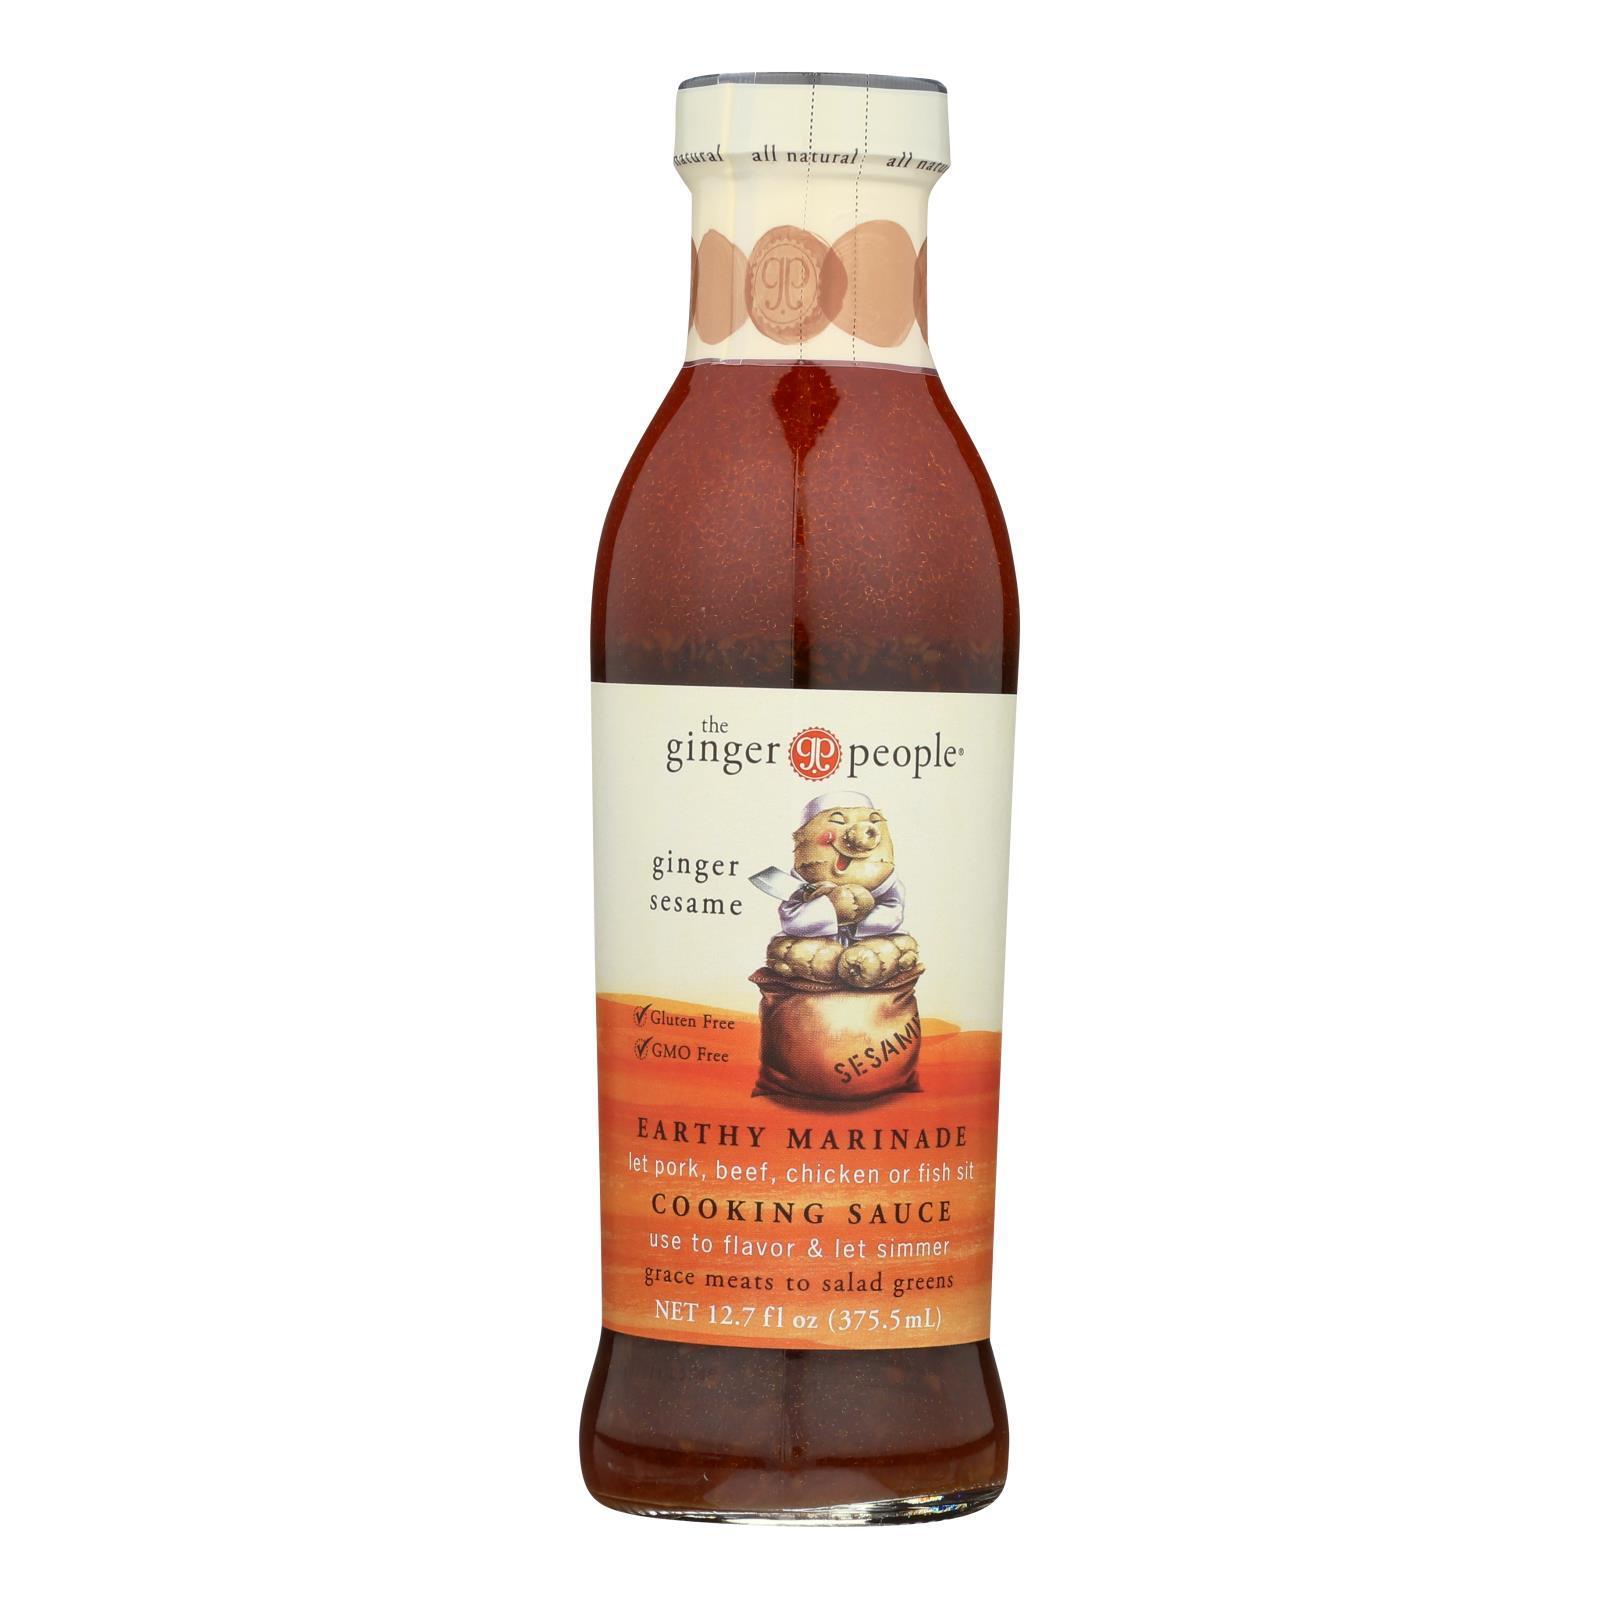 The Ginger People Sauce - Sesame - Case of 12 - 12.7 Fl oz.